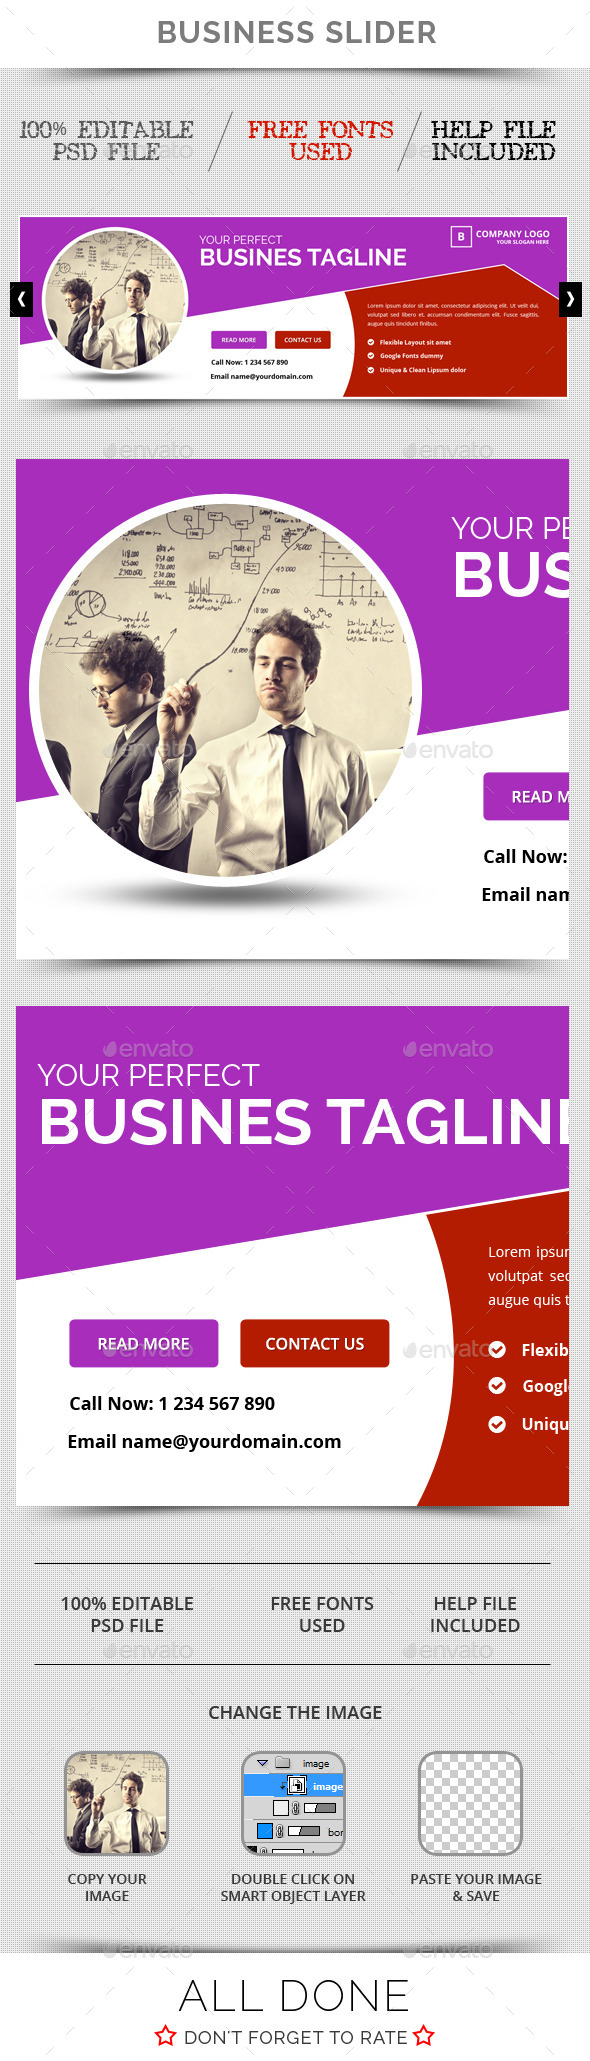 GraphicRiver Business Slider V22 11582443